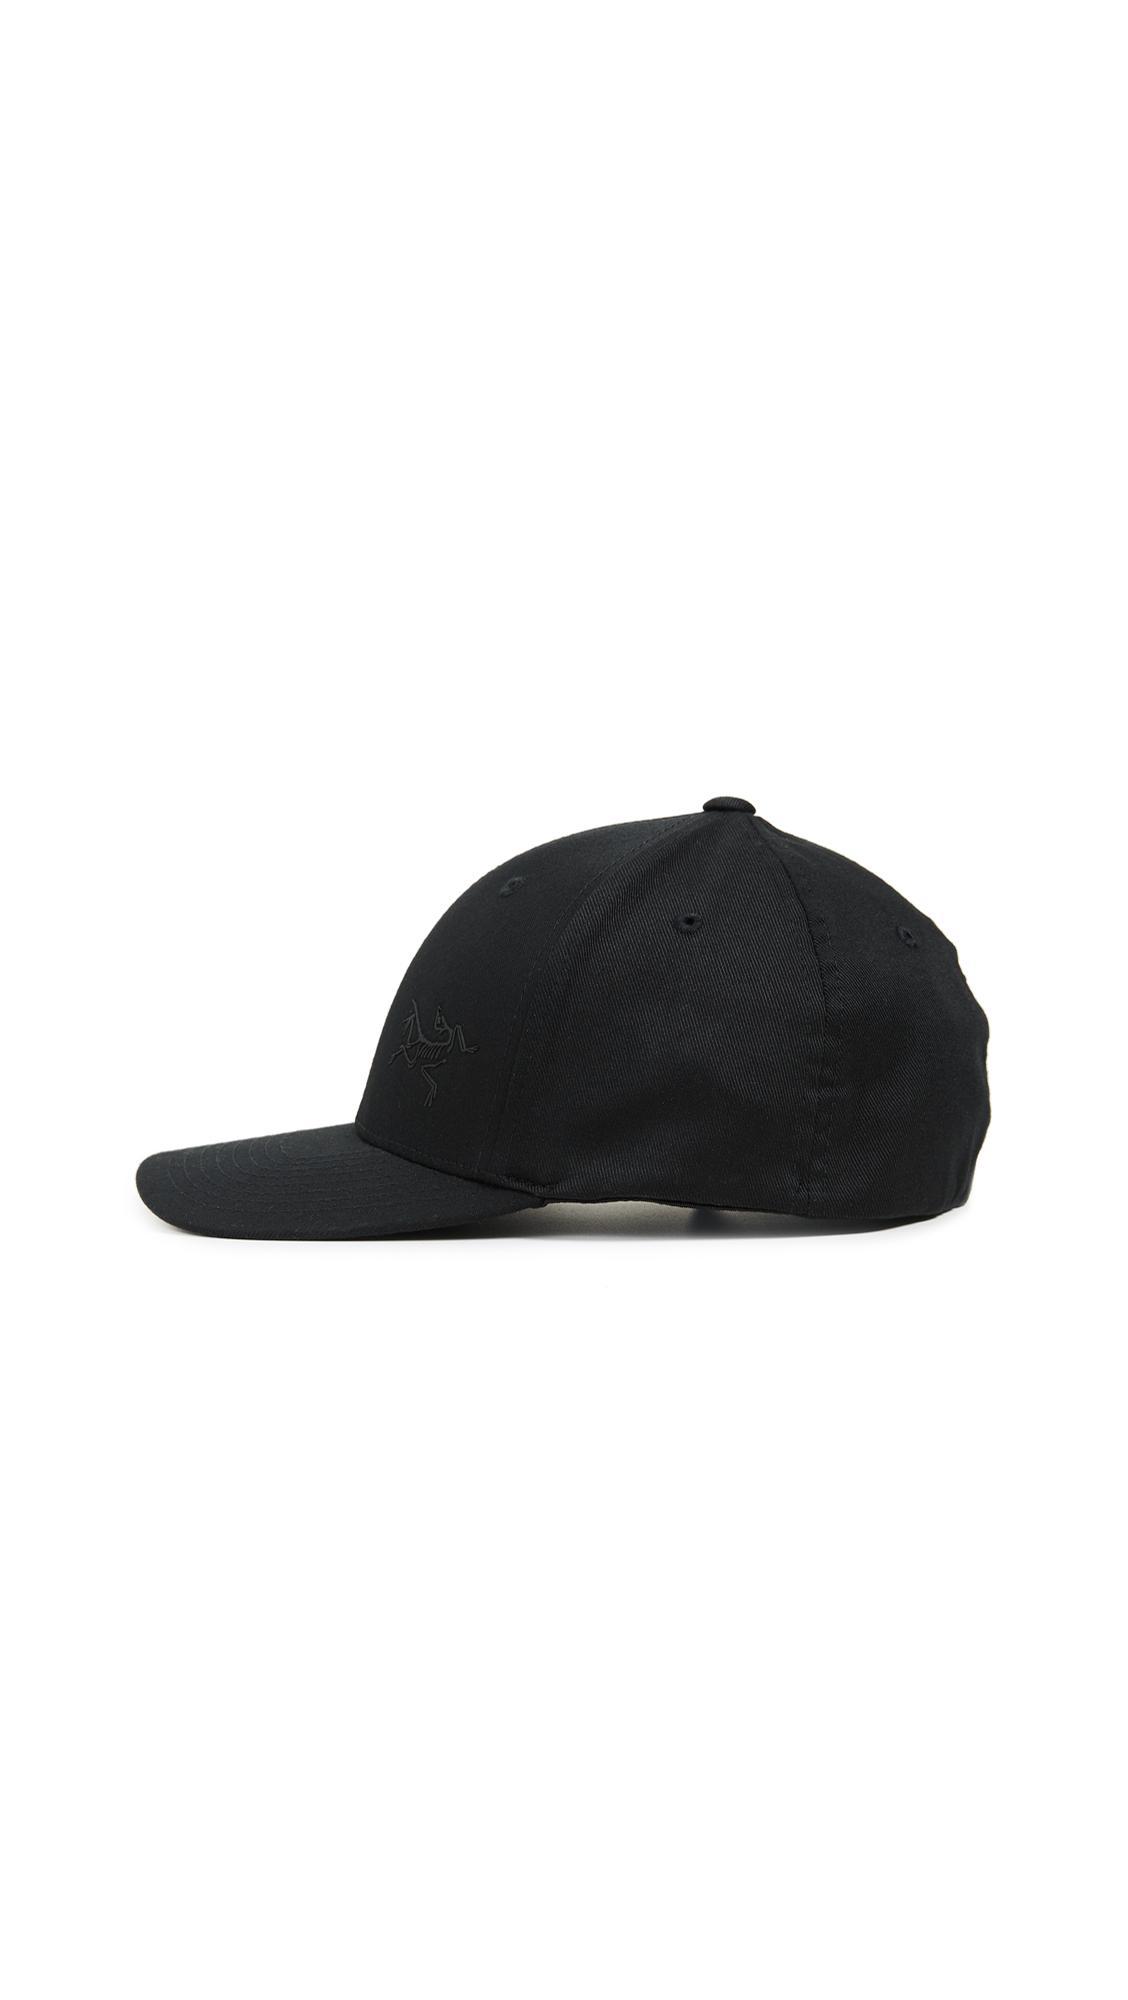 d8d427baf Lyst - Arc'teryx Bird Cap in Black for Men